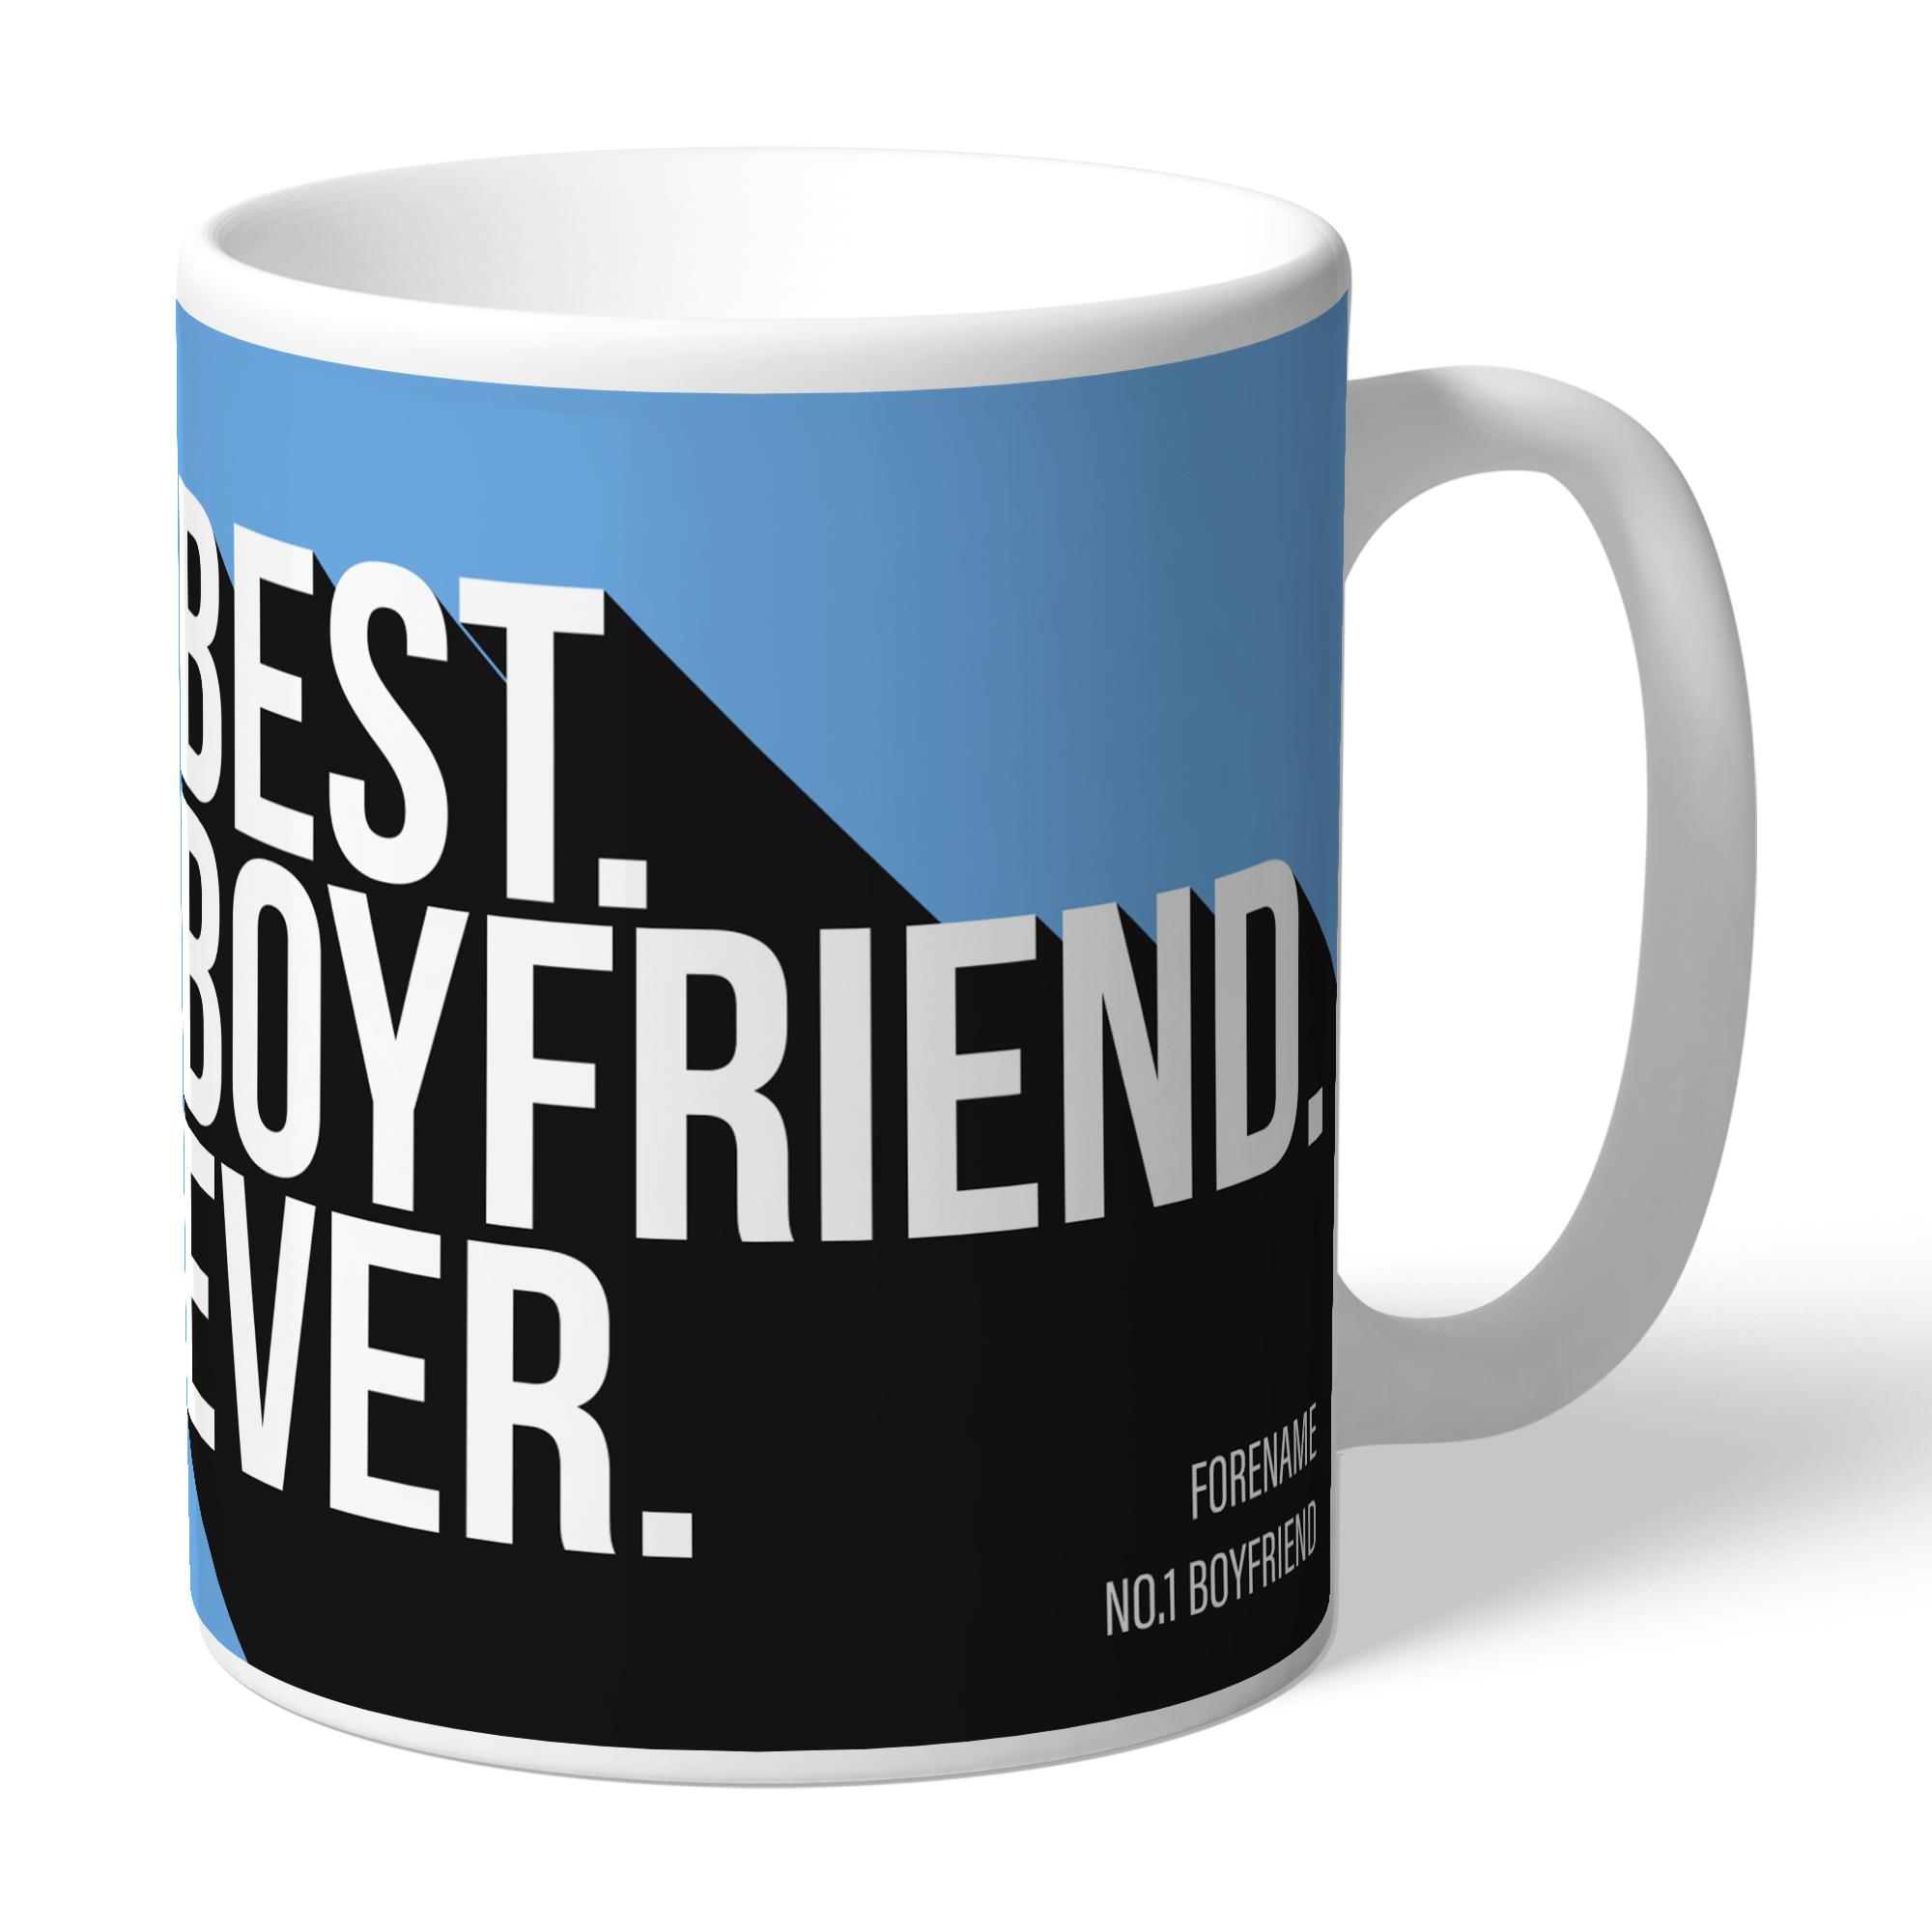 Manchester City FC Best Boyfriend Ever Mug